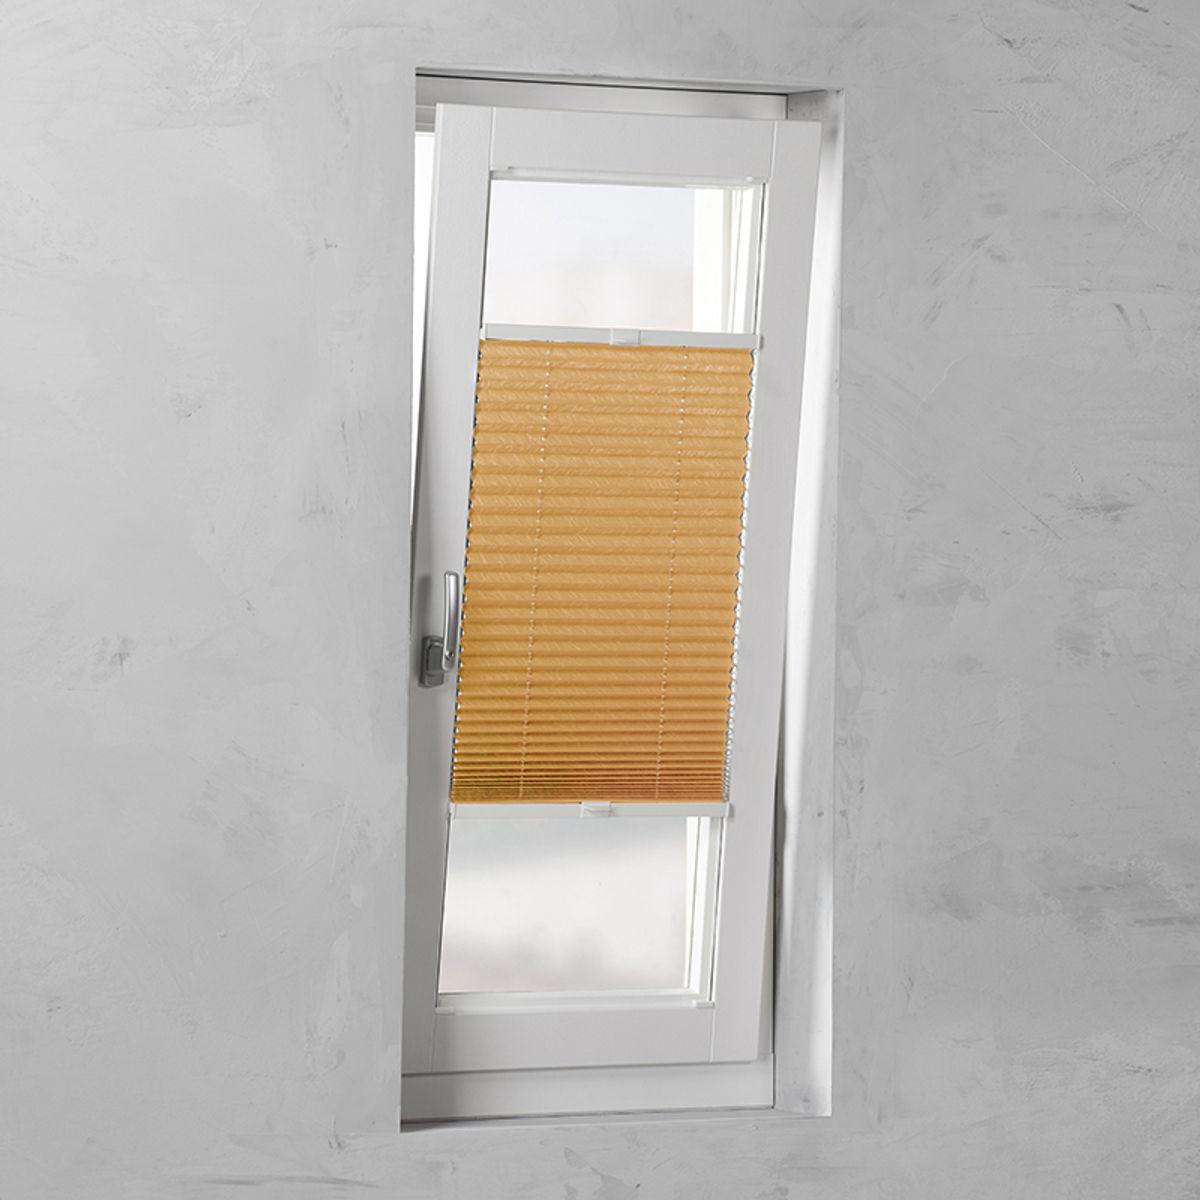 Plisségordijn gespannen - Lichtdoorlatend - Oranje - 120cm x 130cm